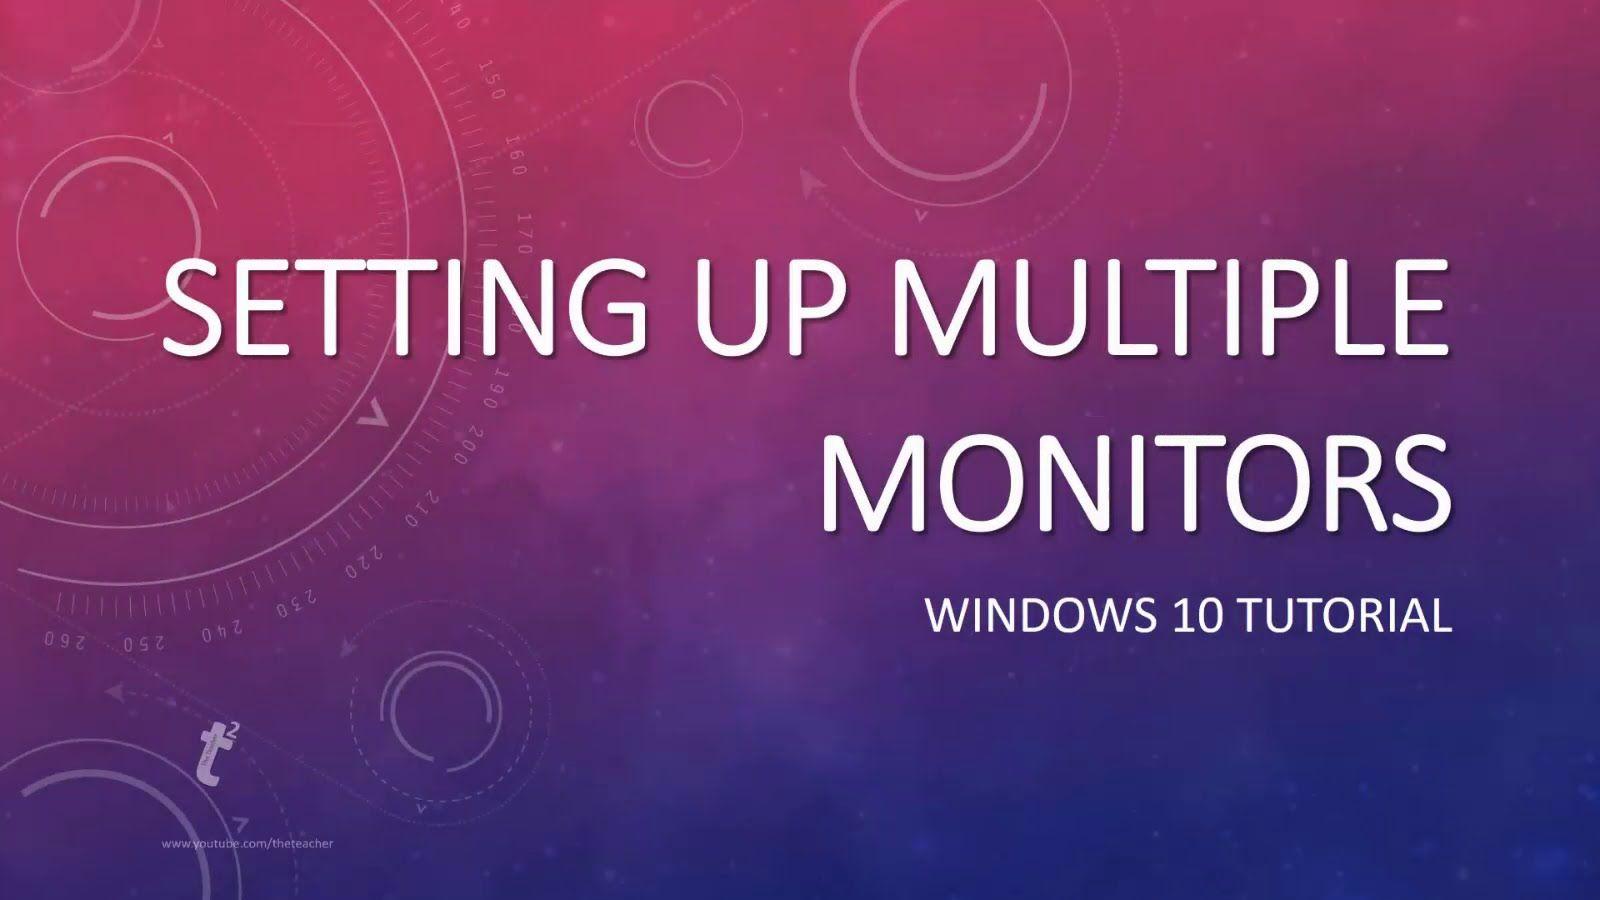 Windows 10 tutorial how to setup multiple monitors windows 10 windows 10 tutorial how to setup multiple monitors baditri Choice Image